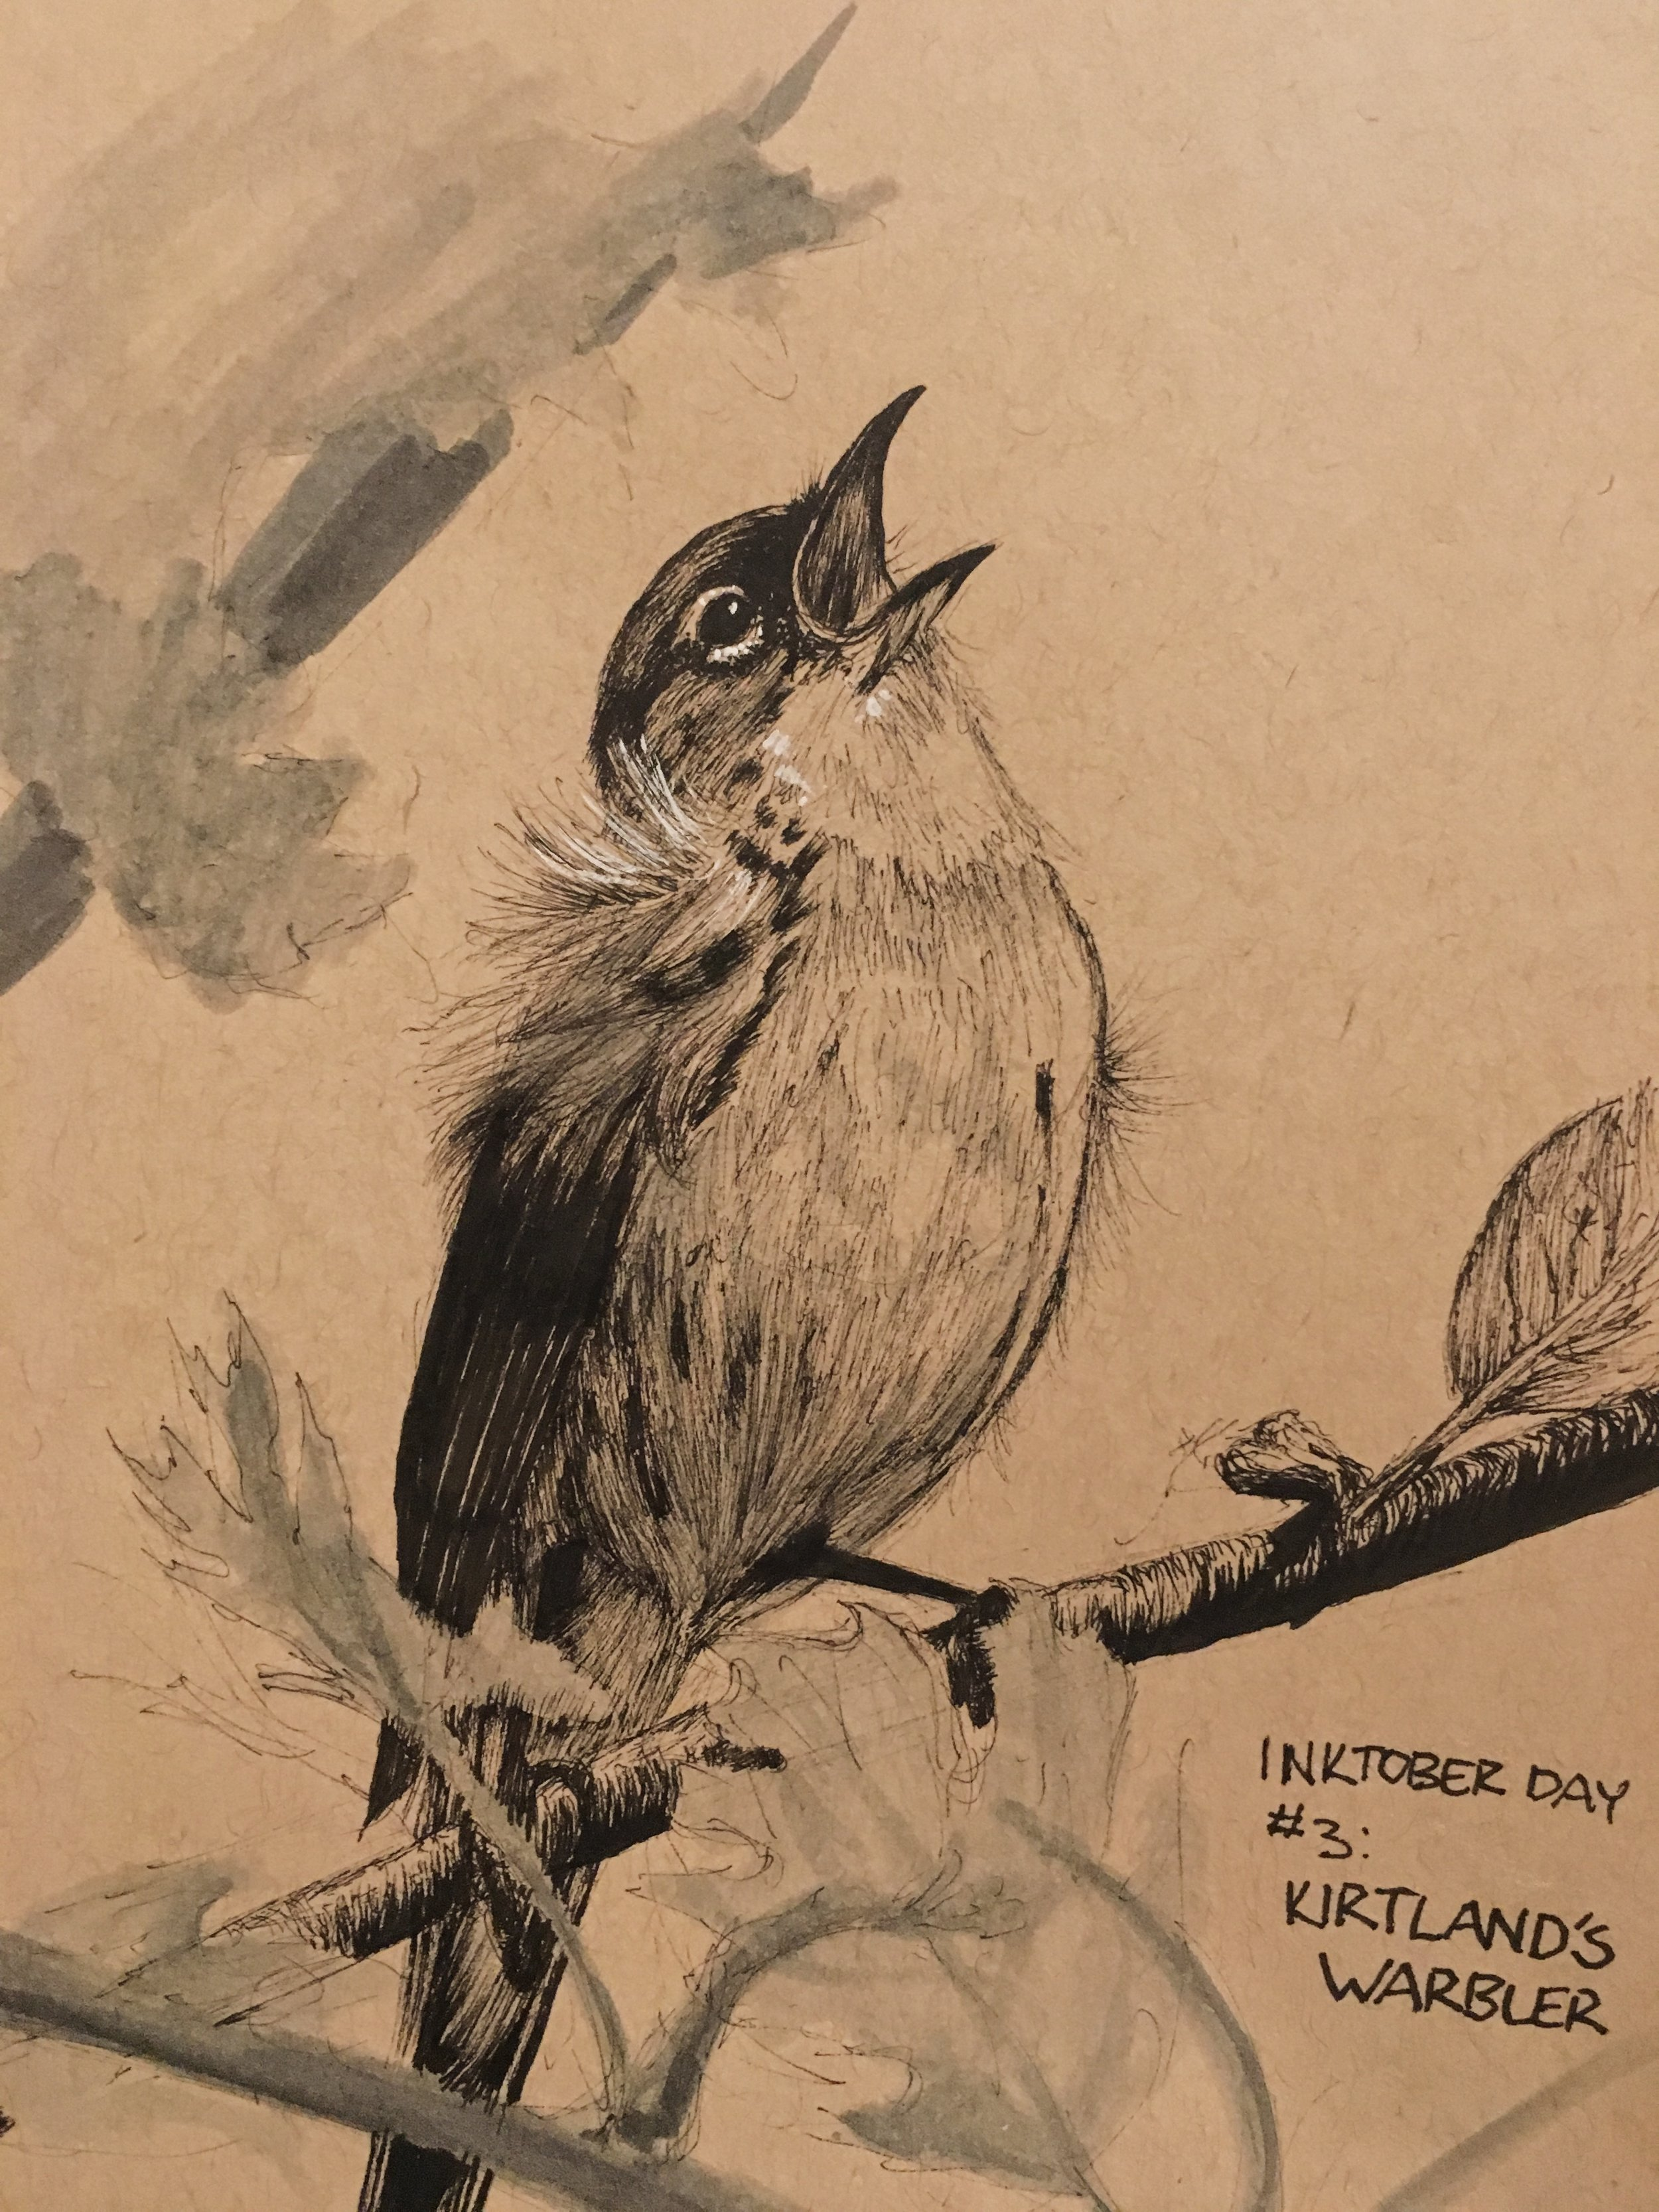 Inktober: Kirtland's Warbler 2018. Ink.